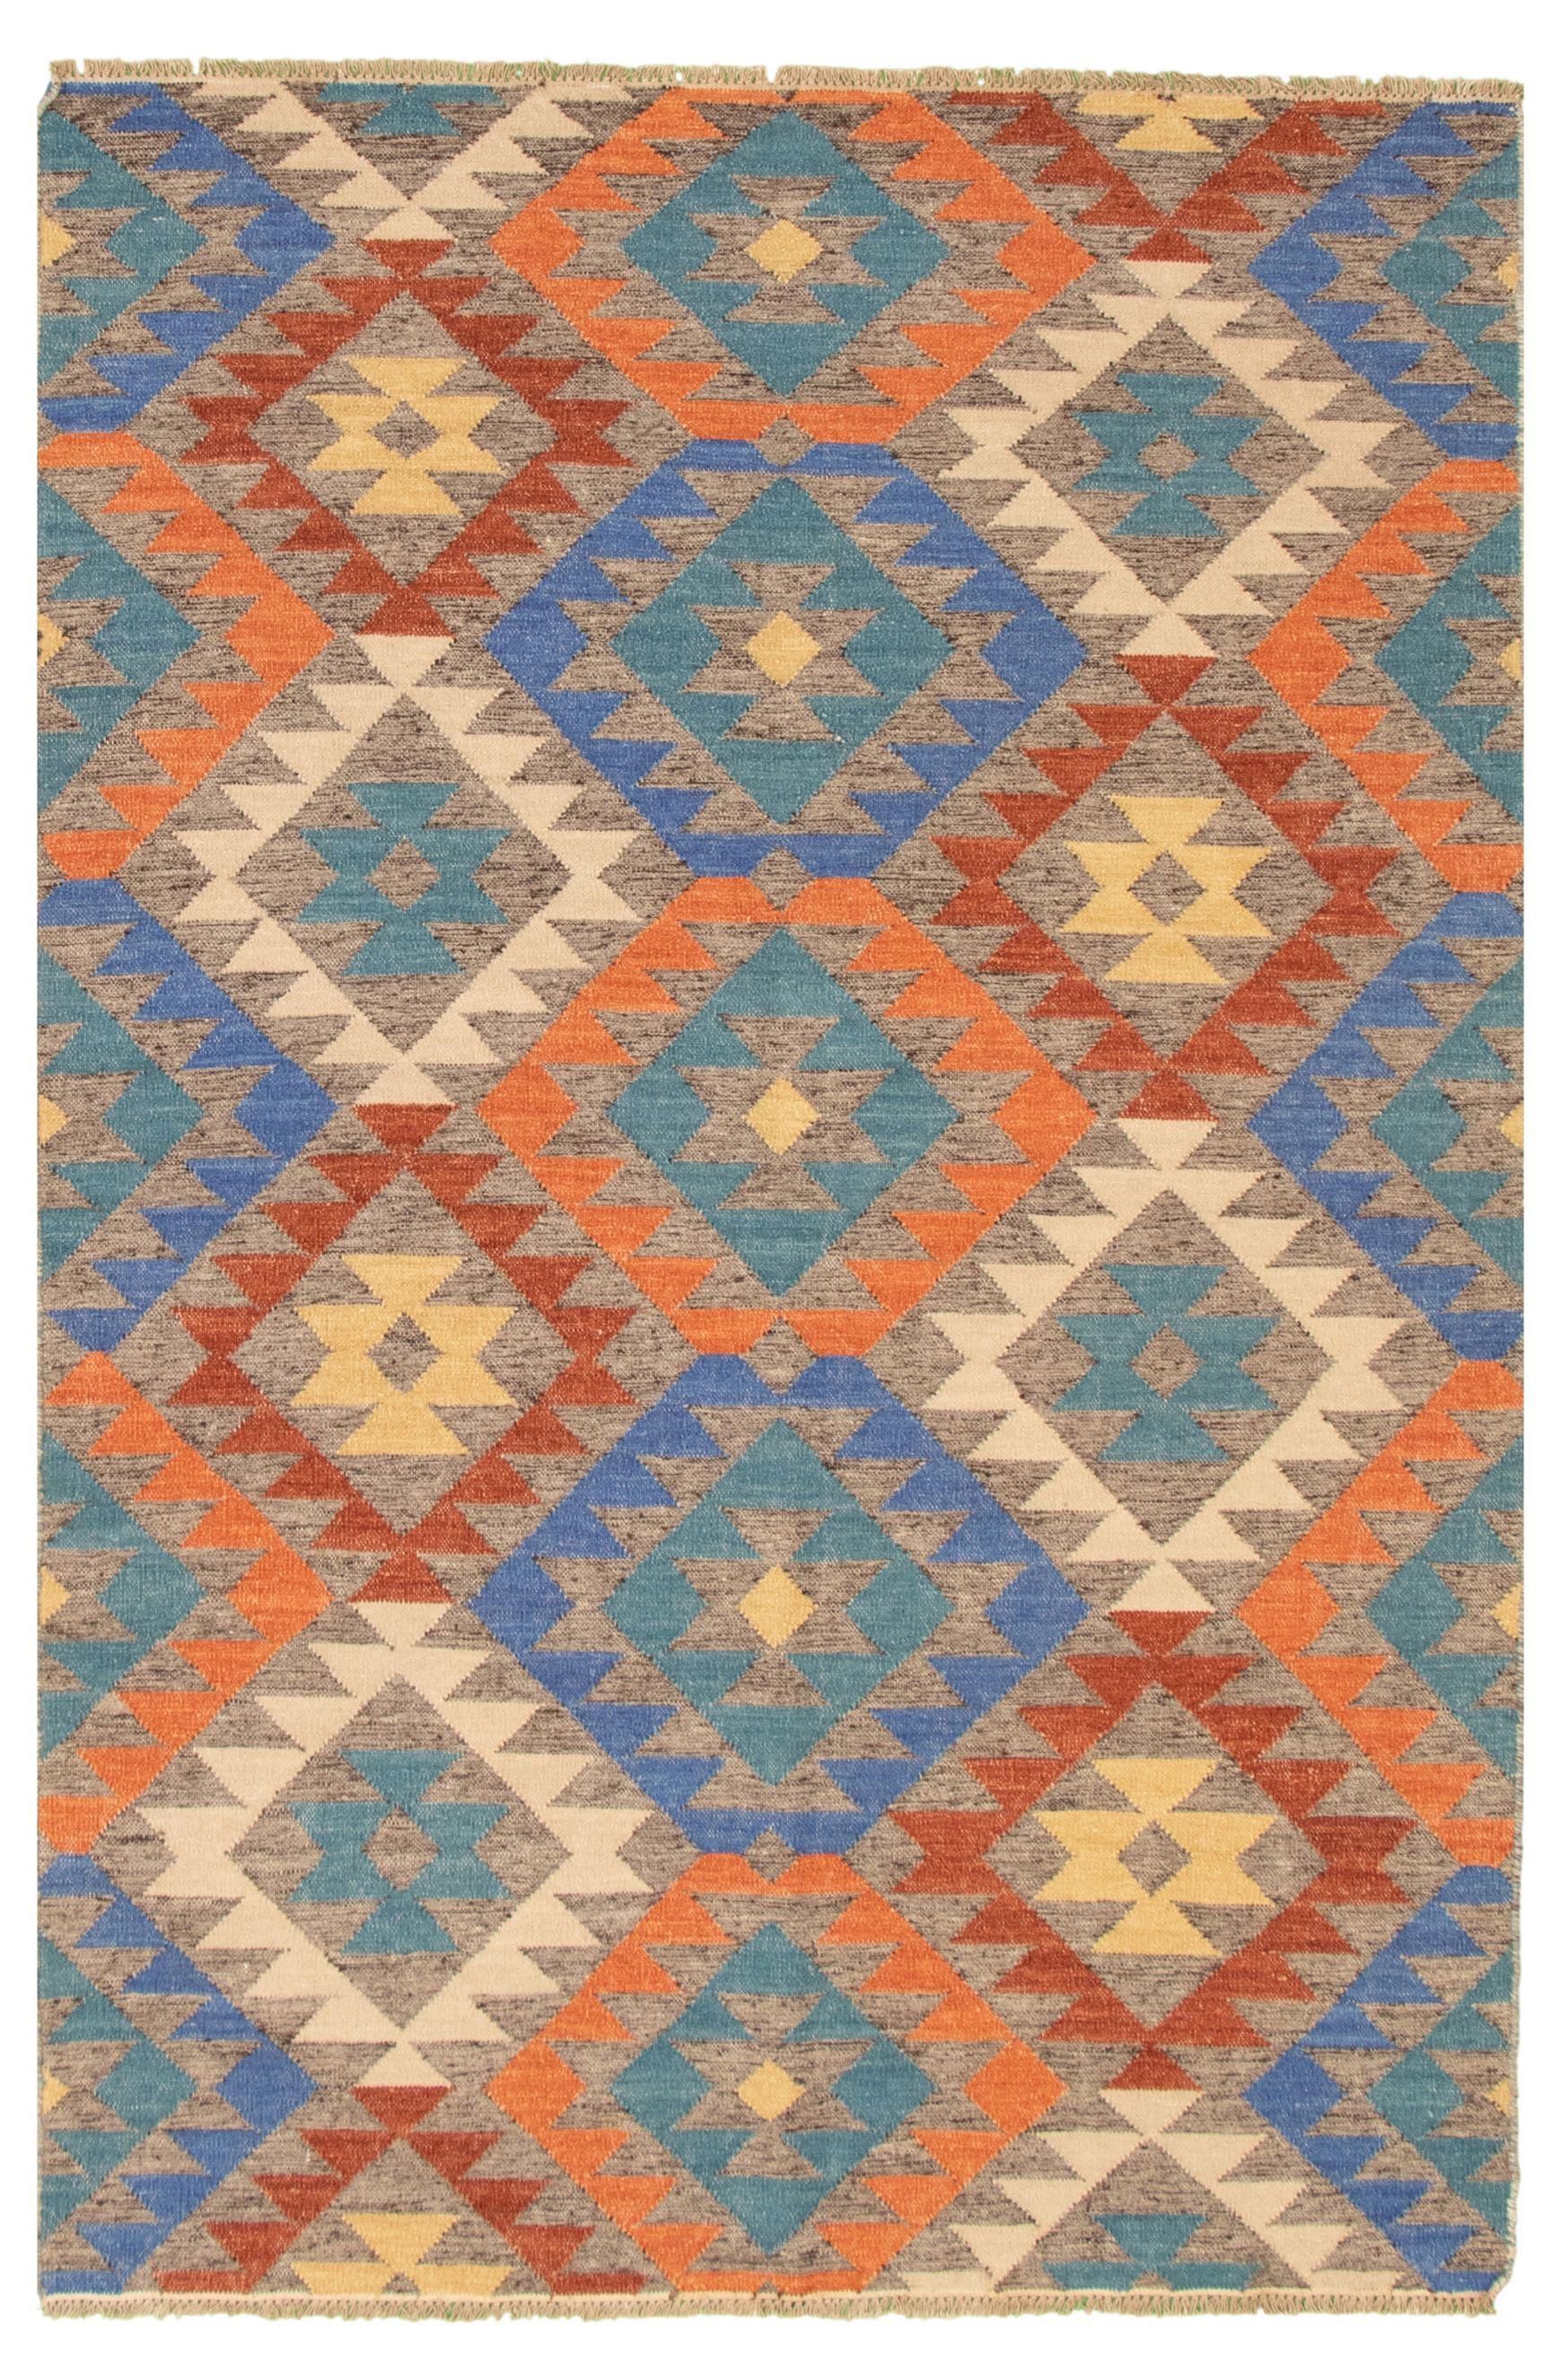 "Hand woven Ankara FW Blue, Copper Wool Kilim 5'2"" x 7'11"" Size: 5'2"" x 7'11"""